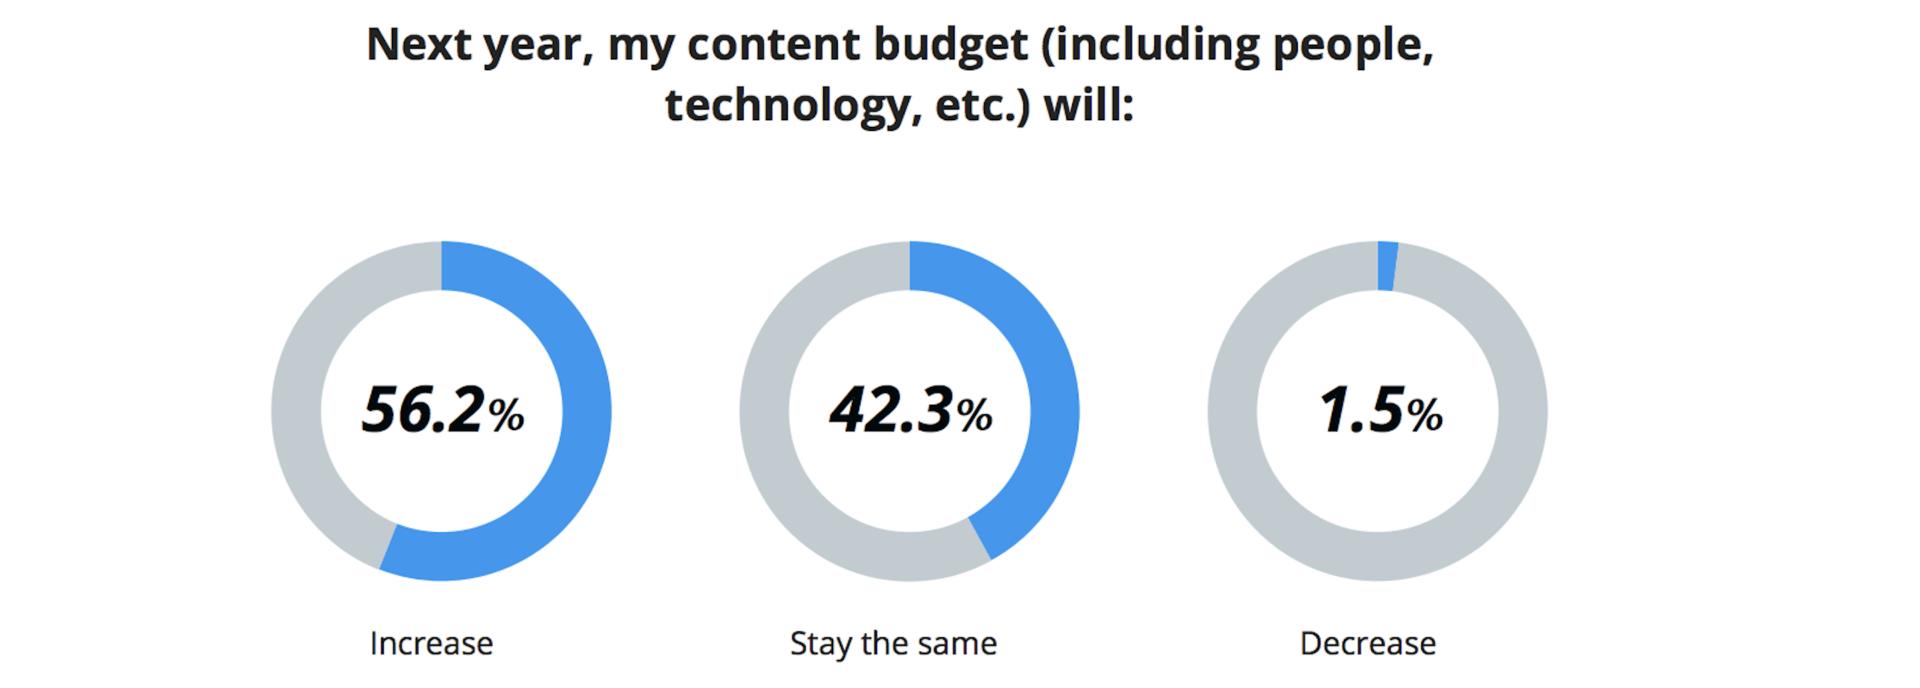 Content Team Budget Statistic 2019